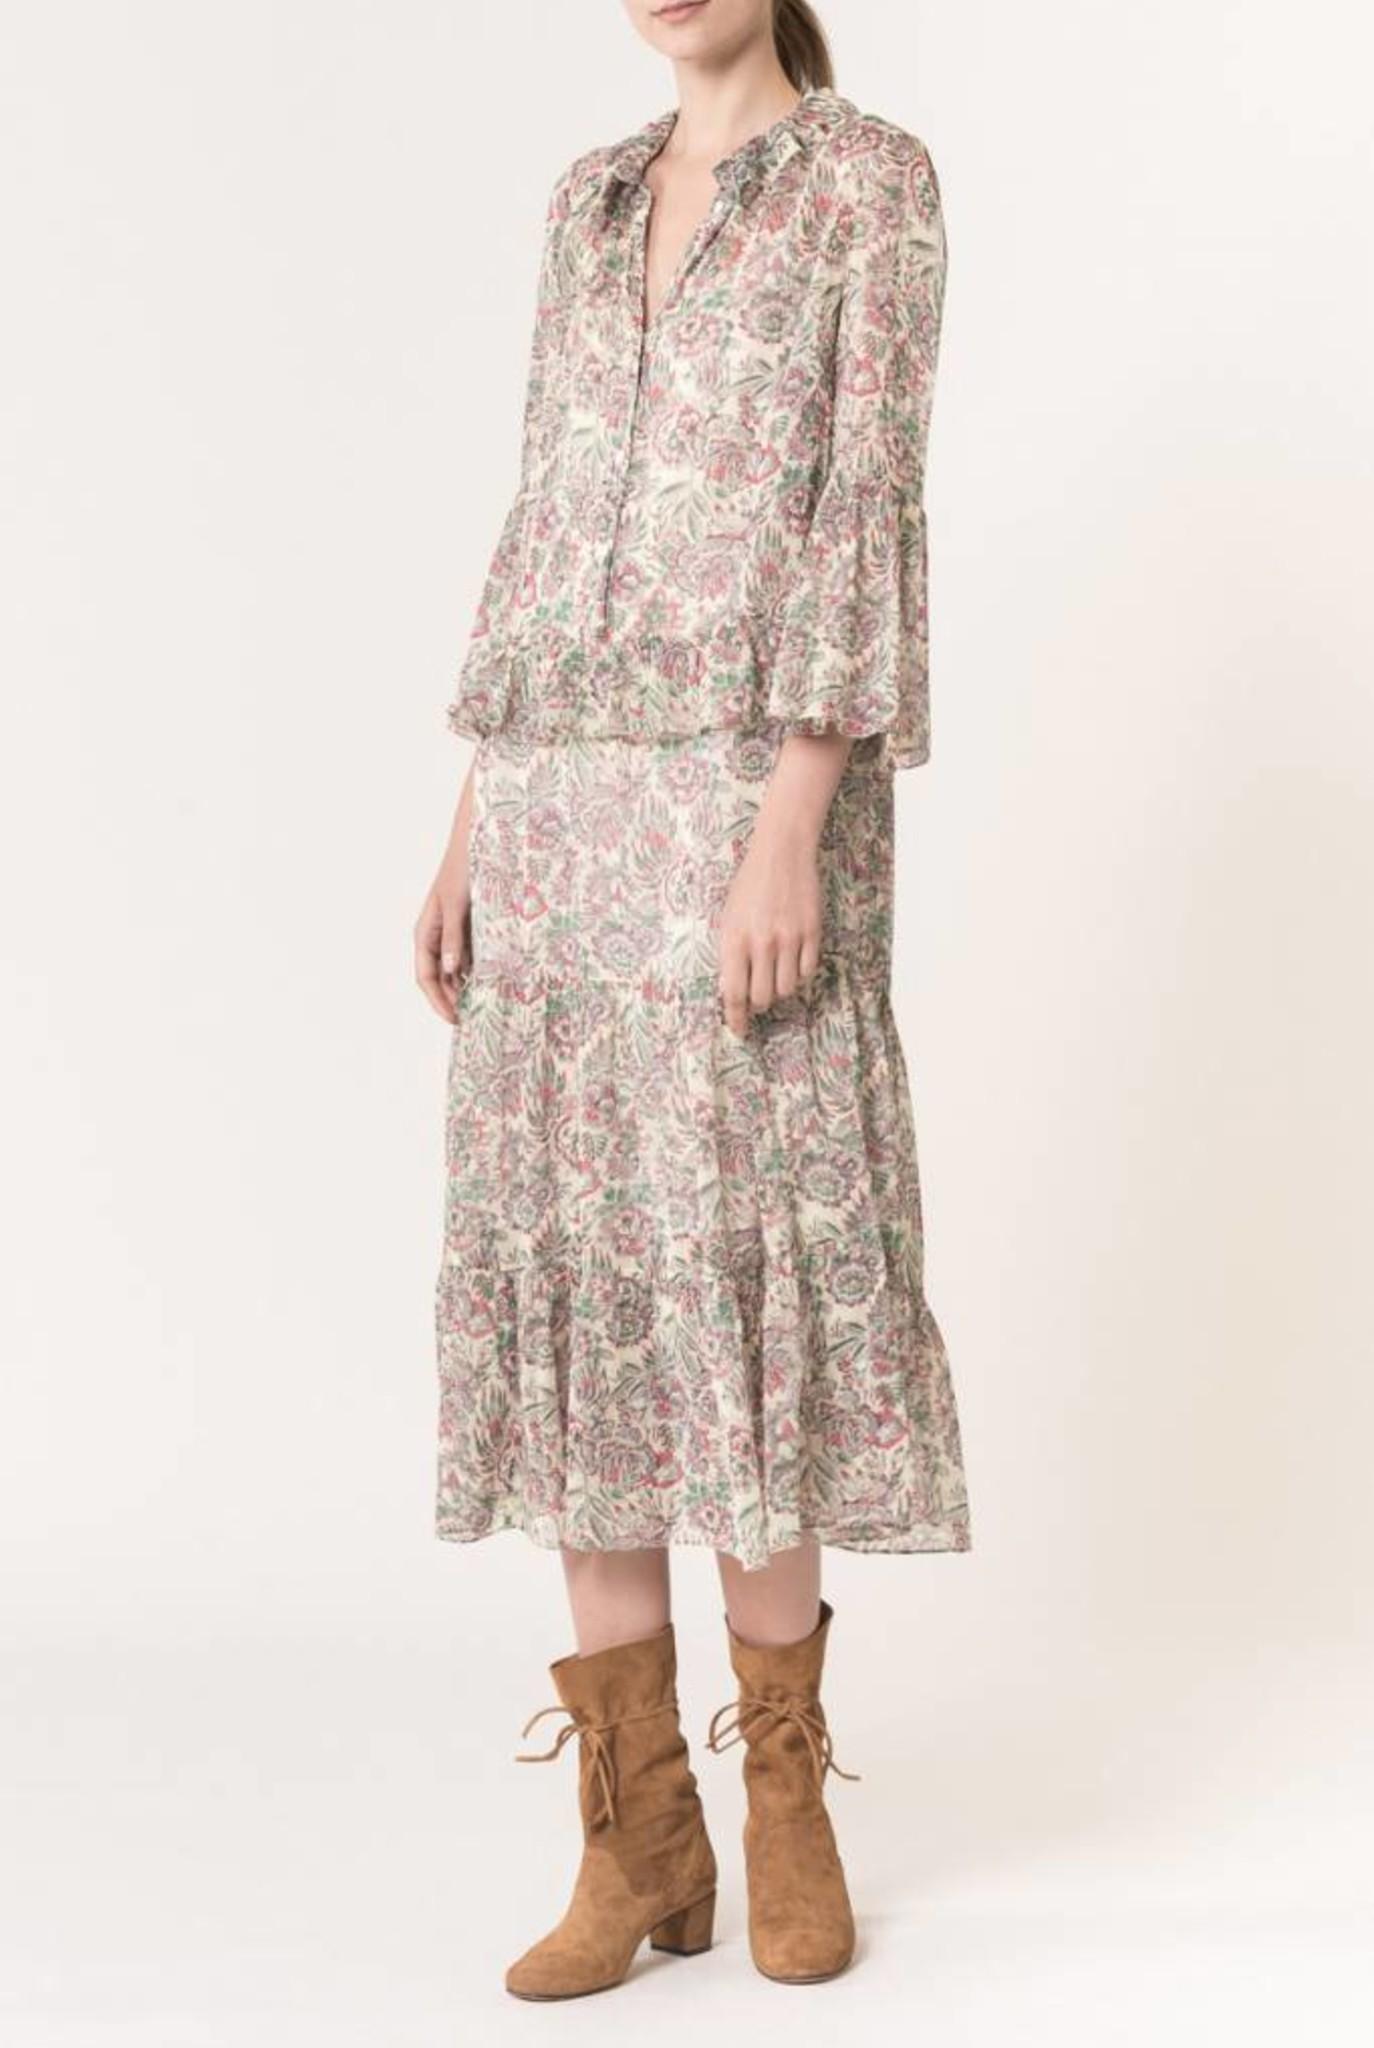 Lilas dress floral